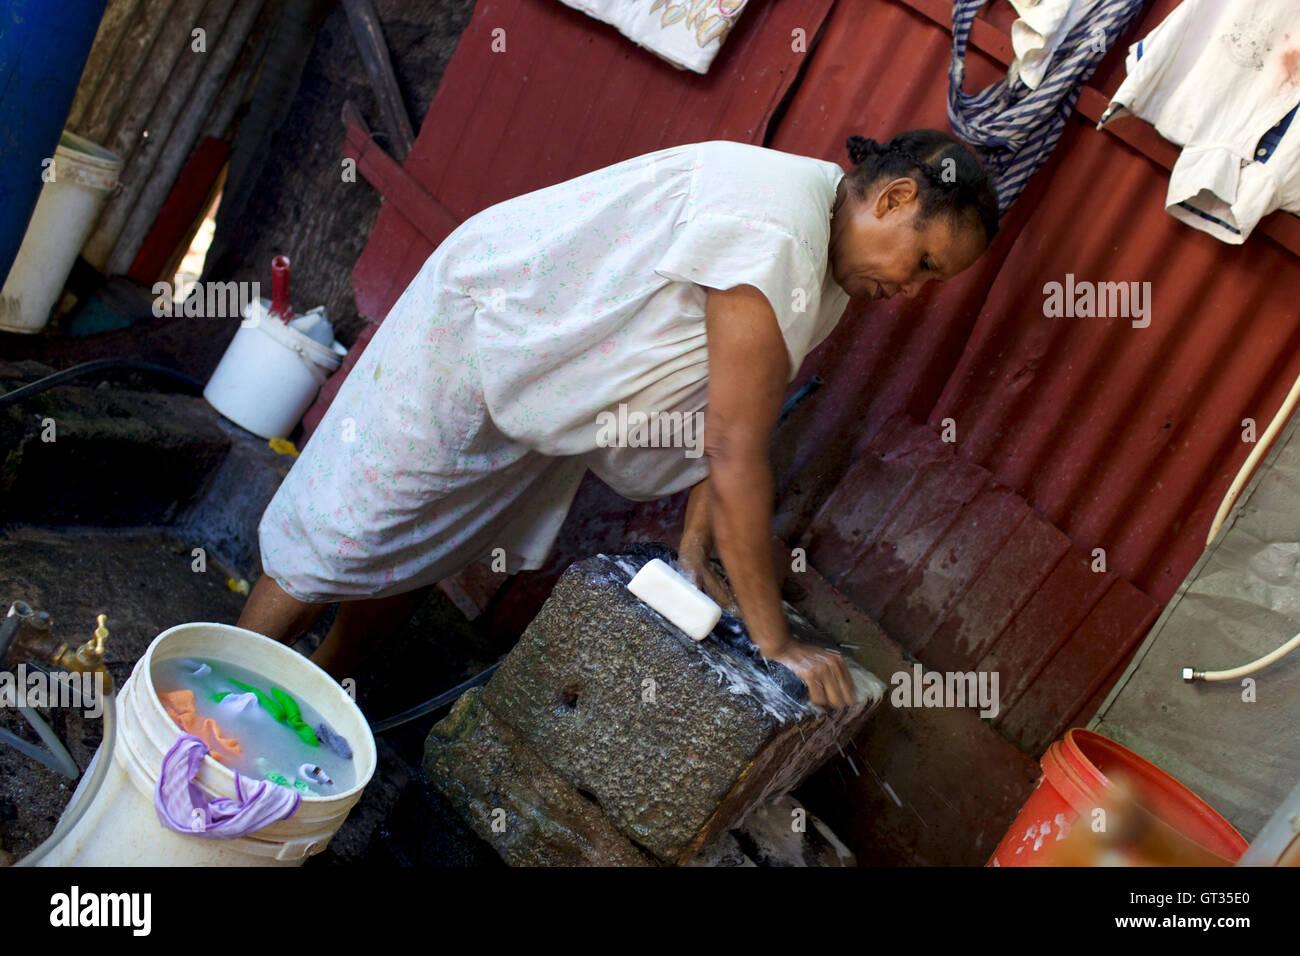 Chagos -  04/04/2012  -  Mauritius  -  Meri Elysee, chagos refugee in her kitchen, Baie du Tombeau, Mauritius   Stock Photo